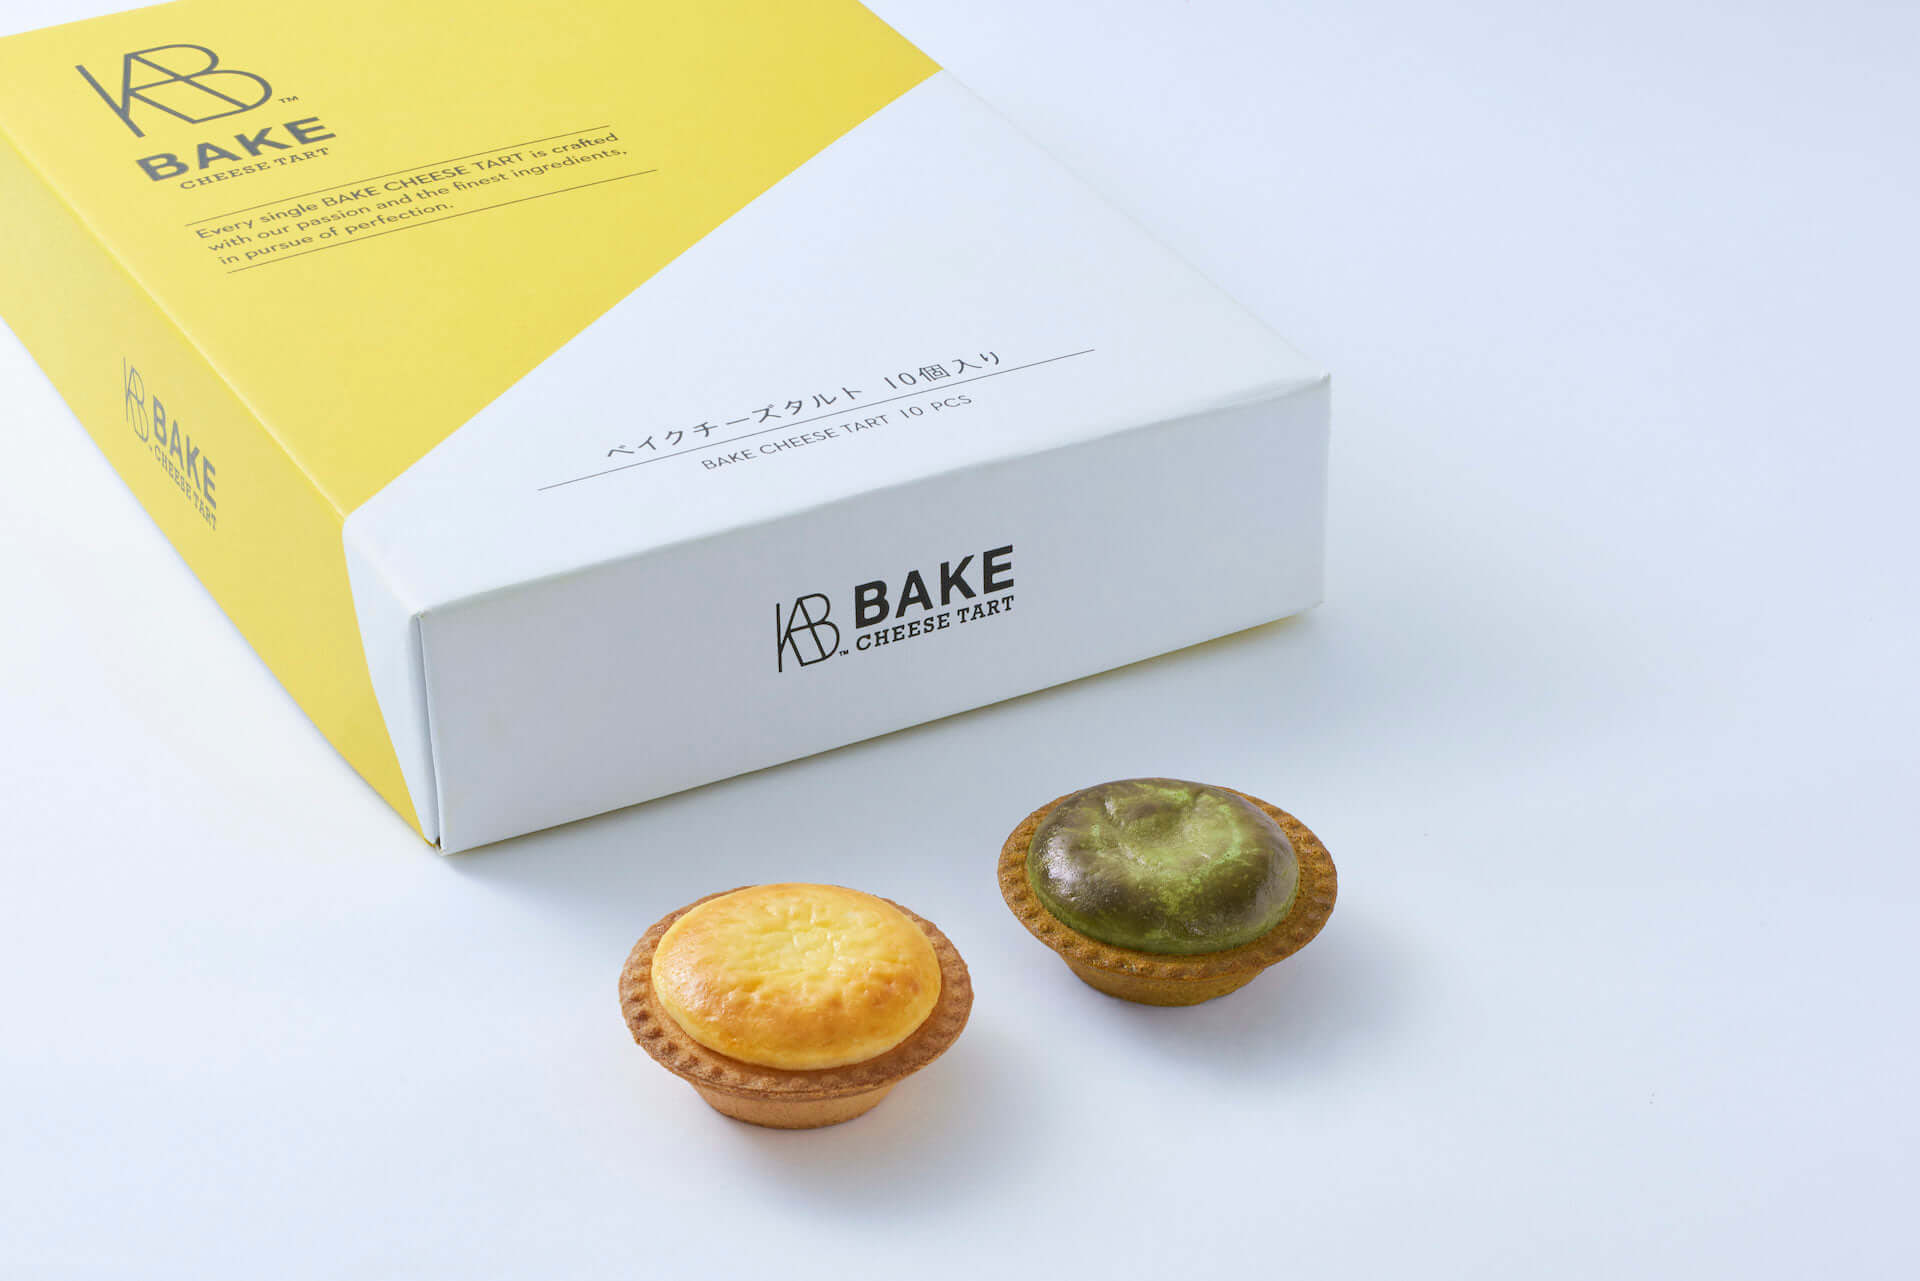 BAKE初の公式オンラインショップ「BAKE THE ONLINE」がオープン!チーズタルト10P BOXが50%OFFの特別価格に gourmet_bake_online_04-1920x1281